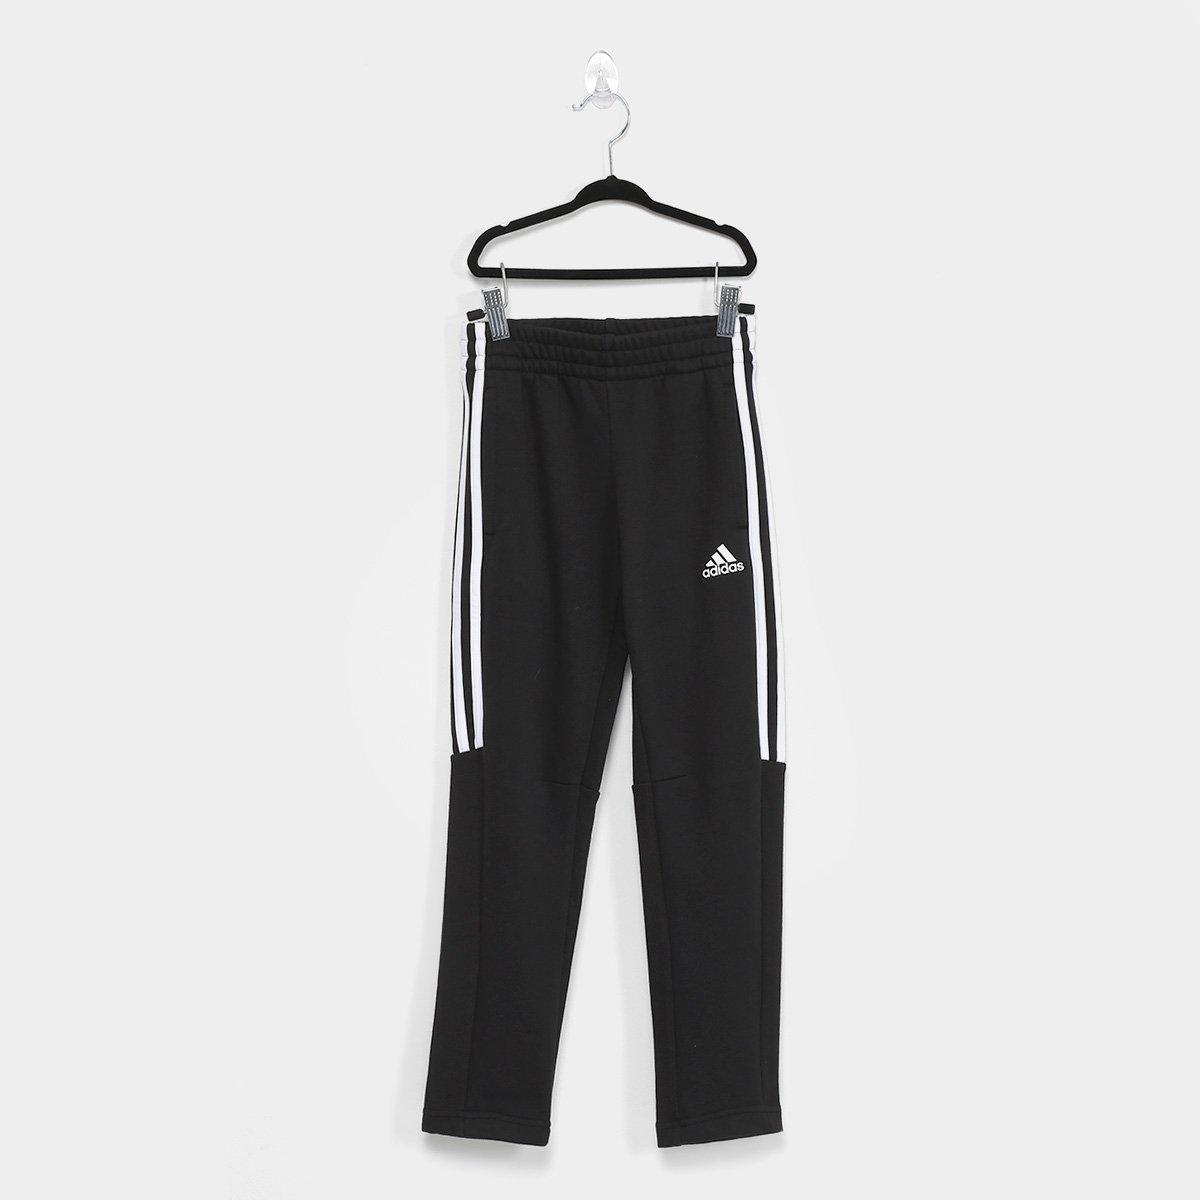 Calça Infantil Adidas Mh 3S Tiro Yb Masculina